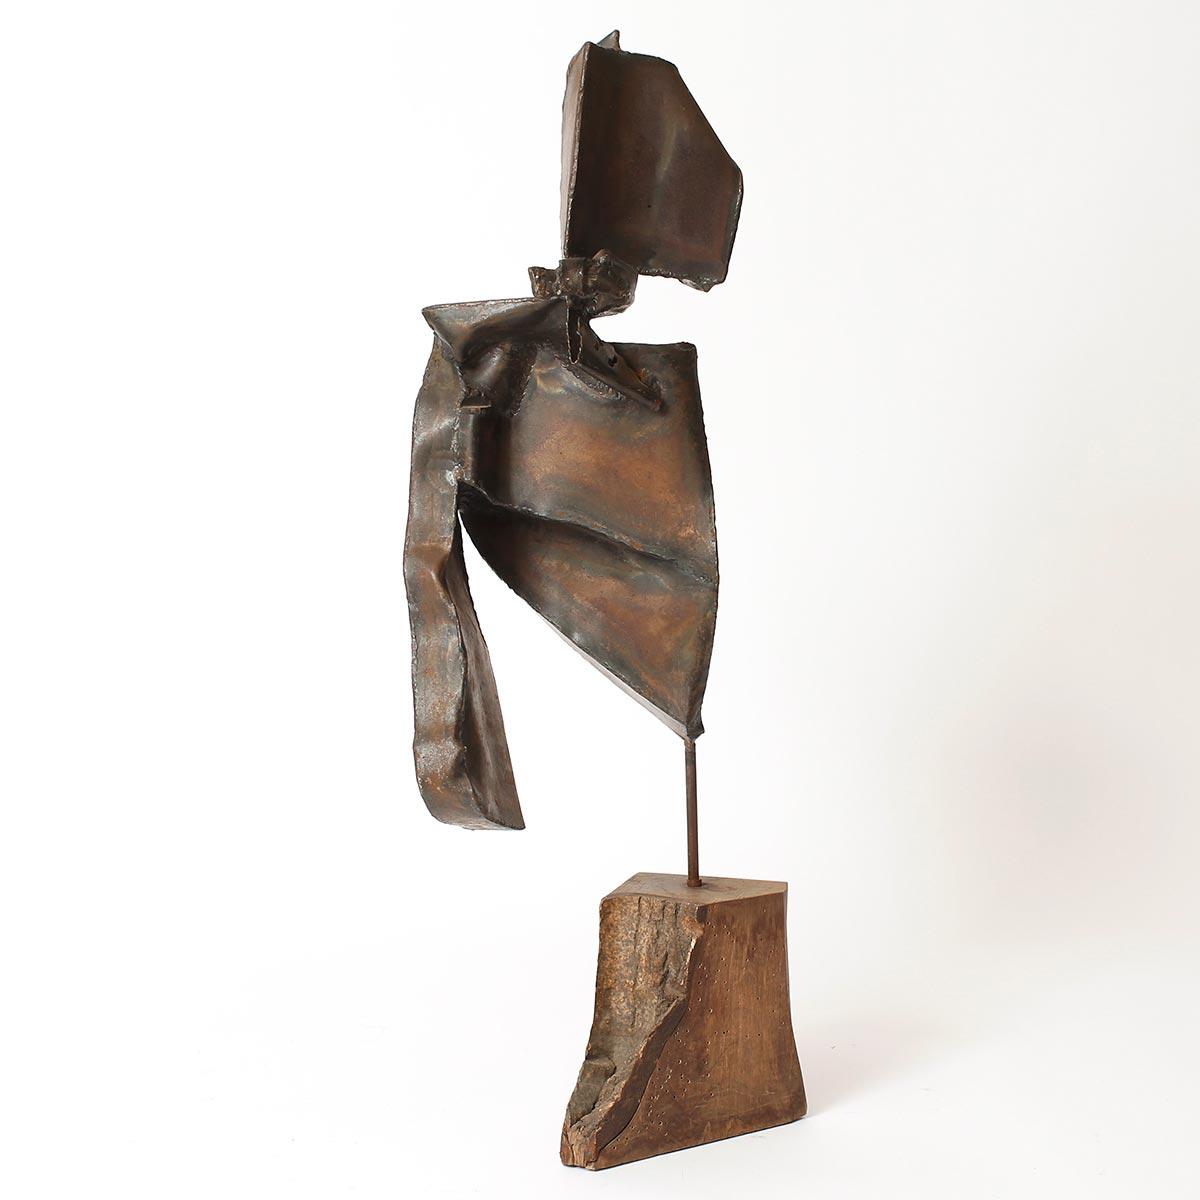 Galerie Insighter Paris by Vanessa Metayer presents Ilio Signori